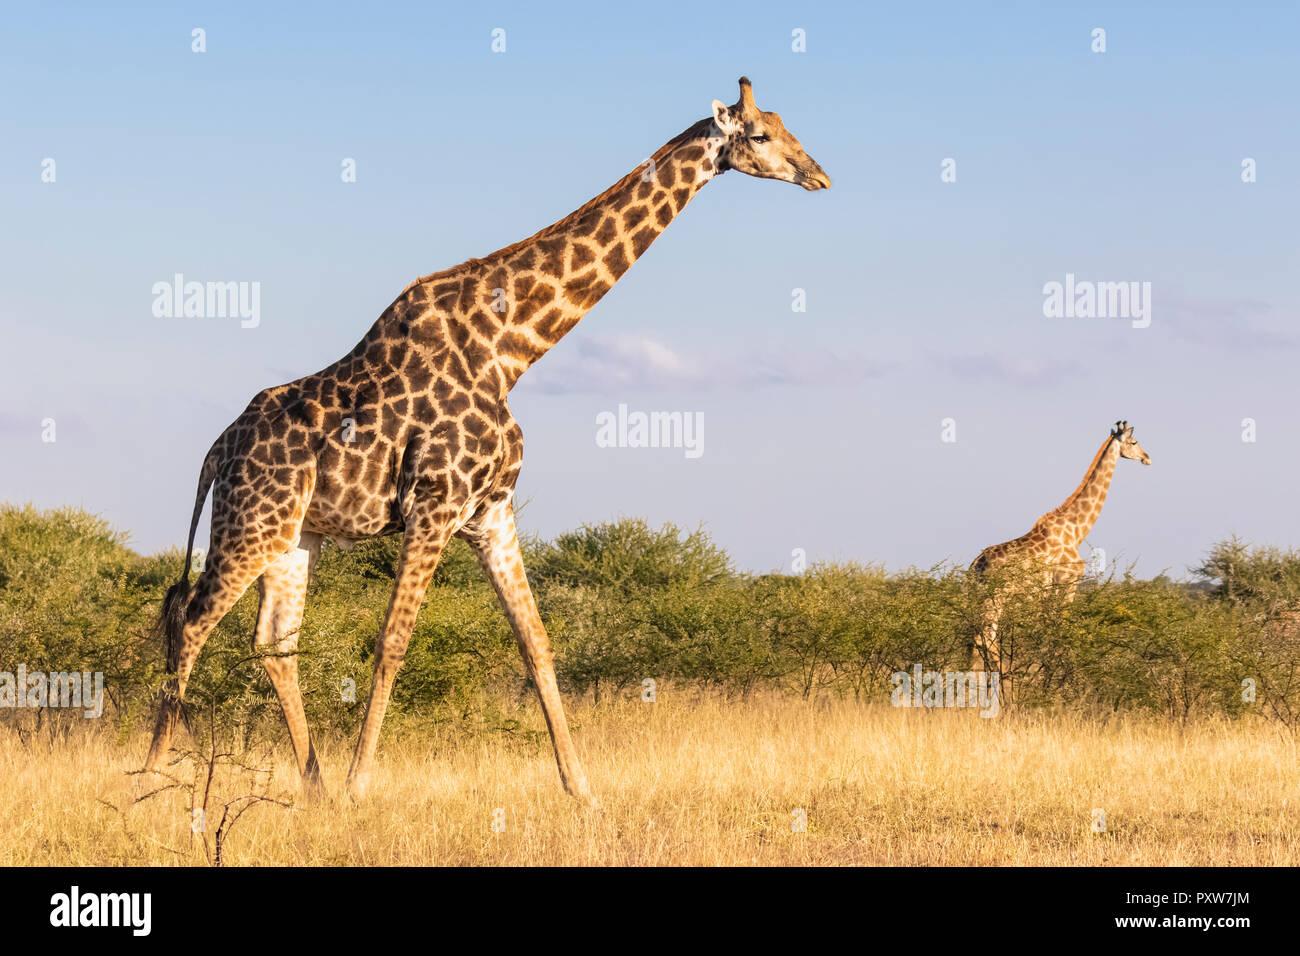 Botswana, Kalahari, Central Kalahari Game Reserve, Giraffes walking, Giraffa camelopardalis - Stock Image